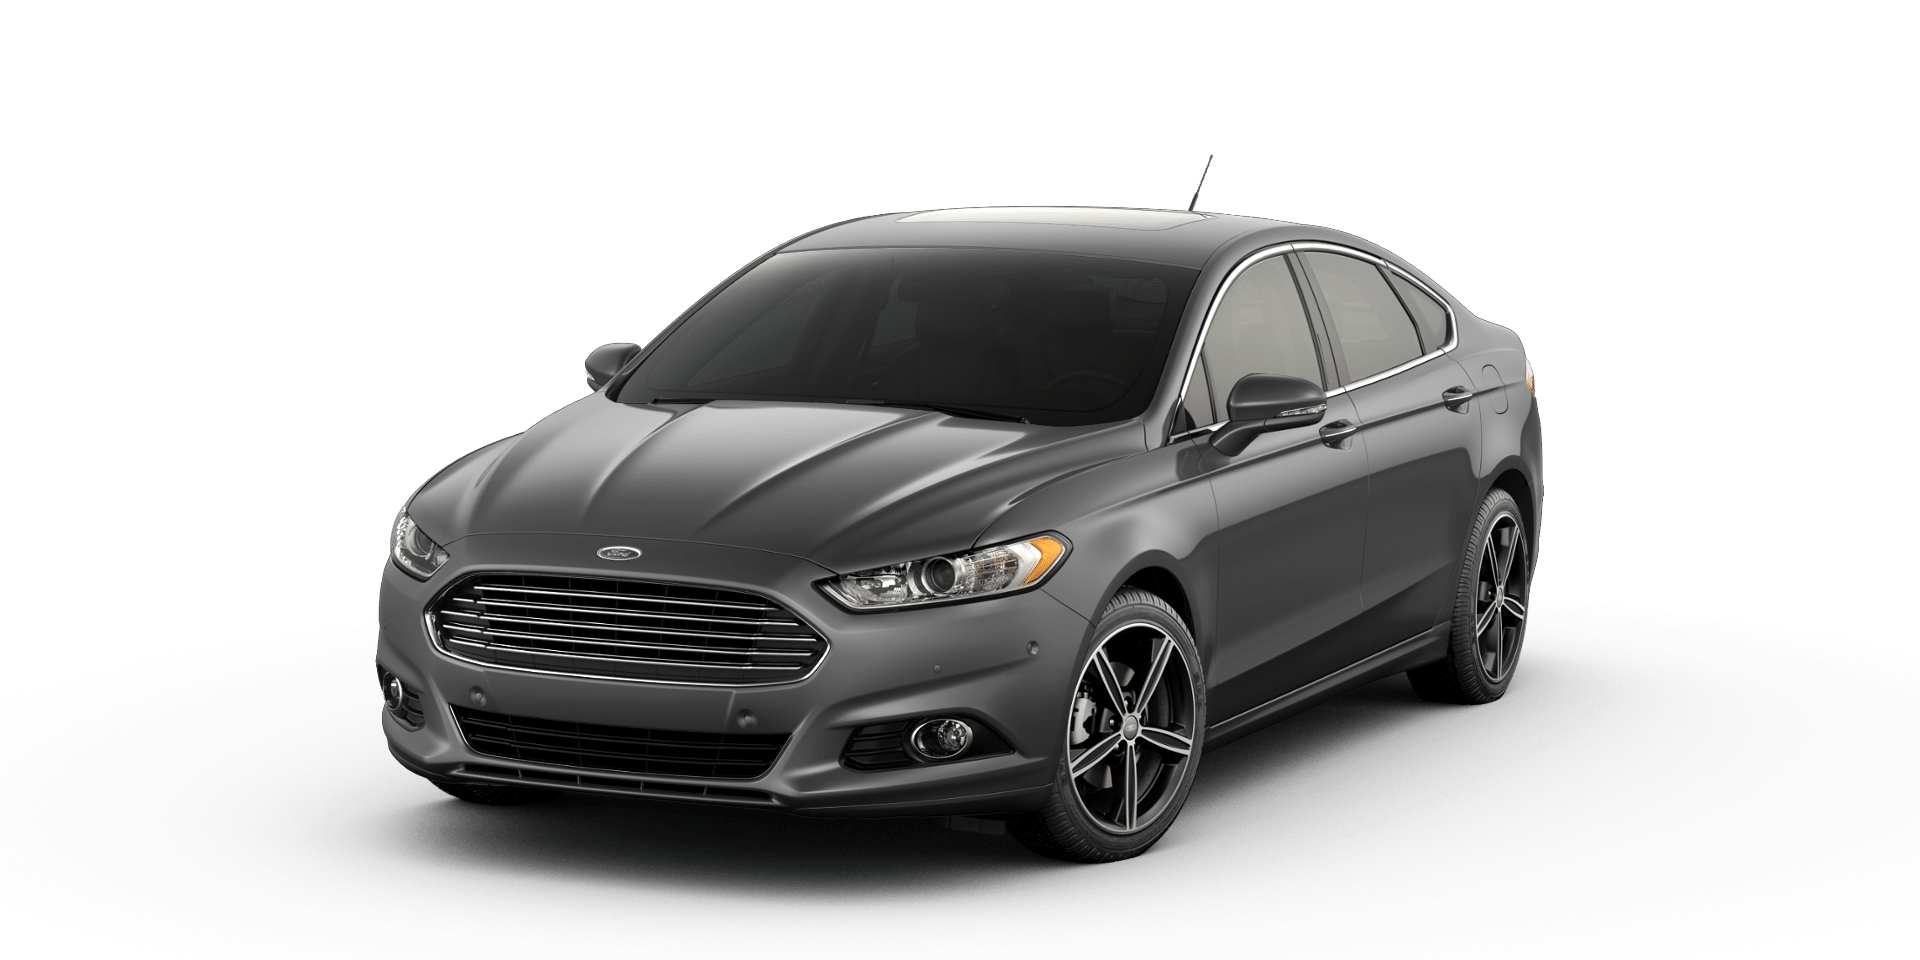 2016 Ford Fusion in Dark Grey Me Kinda Cars Pinterest